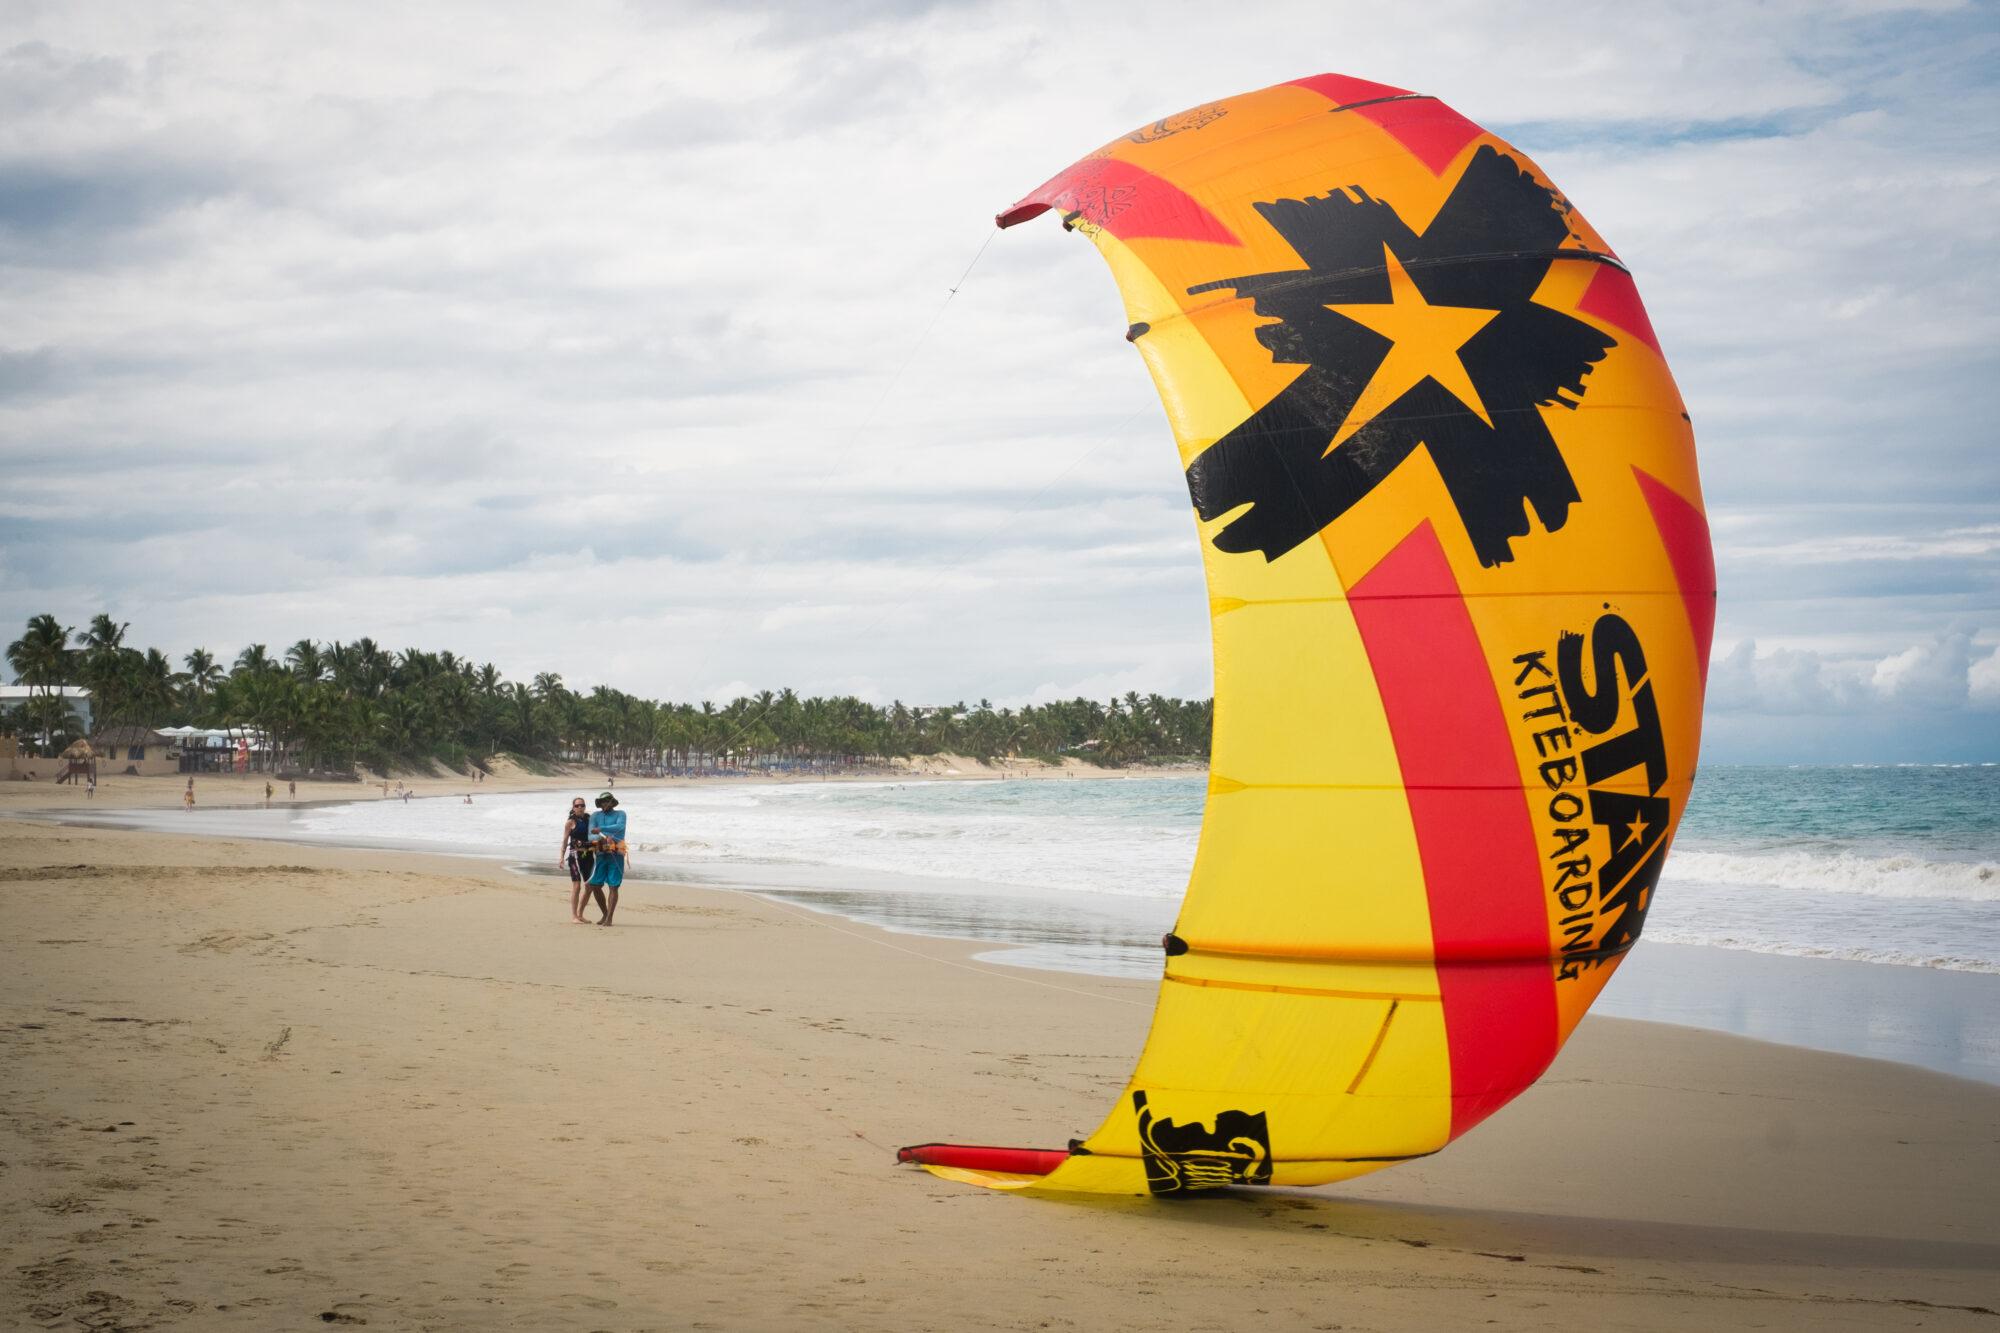 destinatii de vacanta kitesurfing